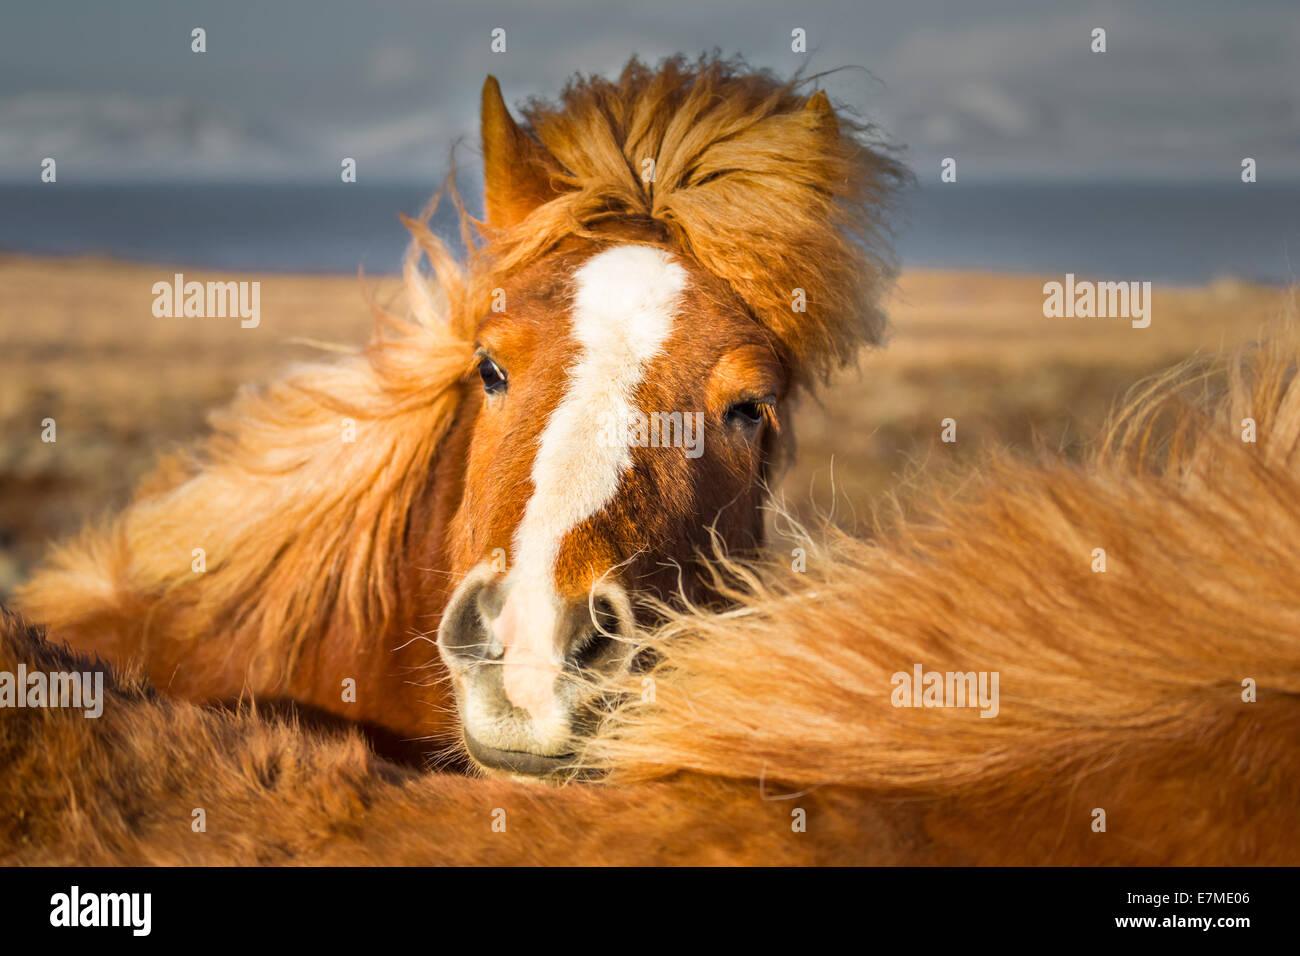 Brown Icelandic horse (Equus ferus caballus) frontal view with manes. - Stock Image